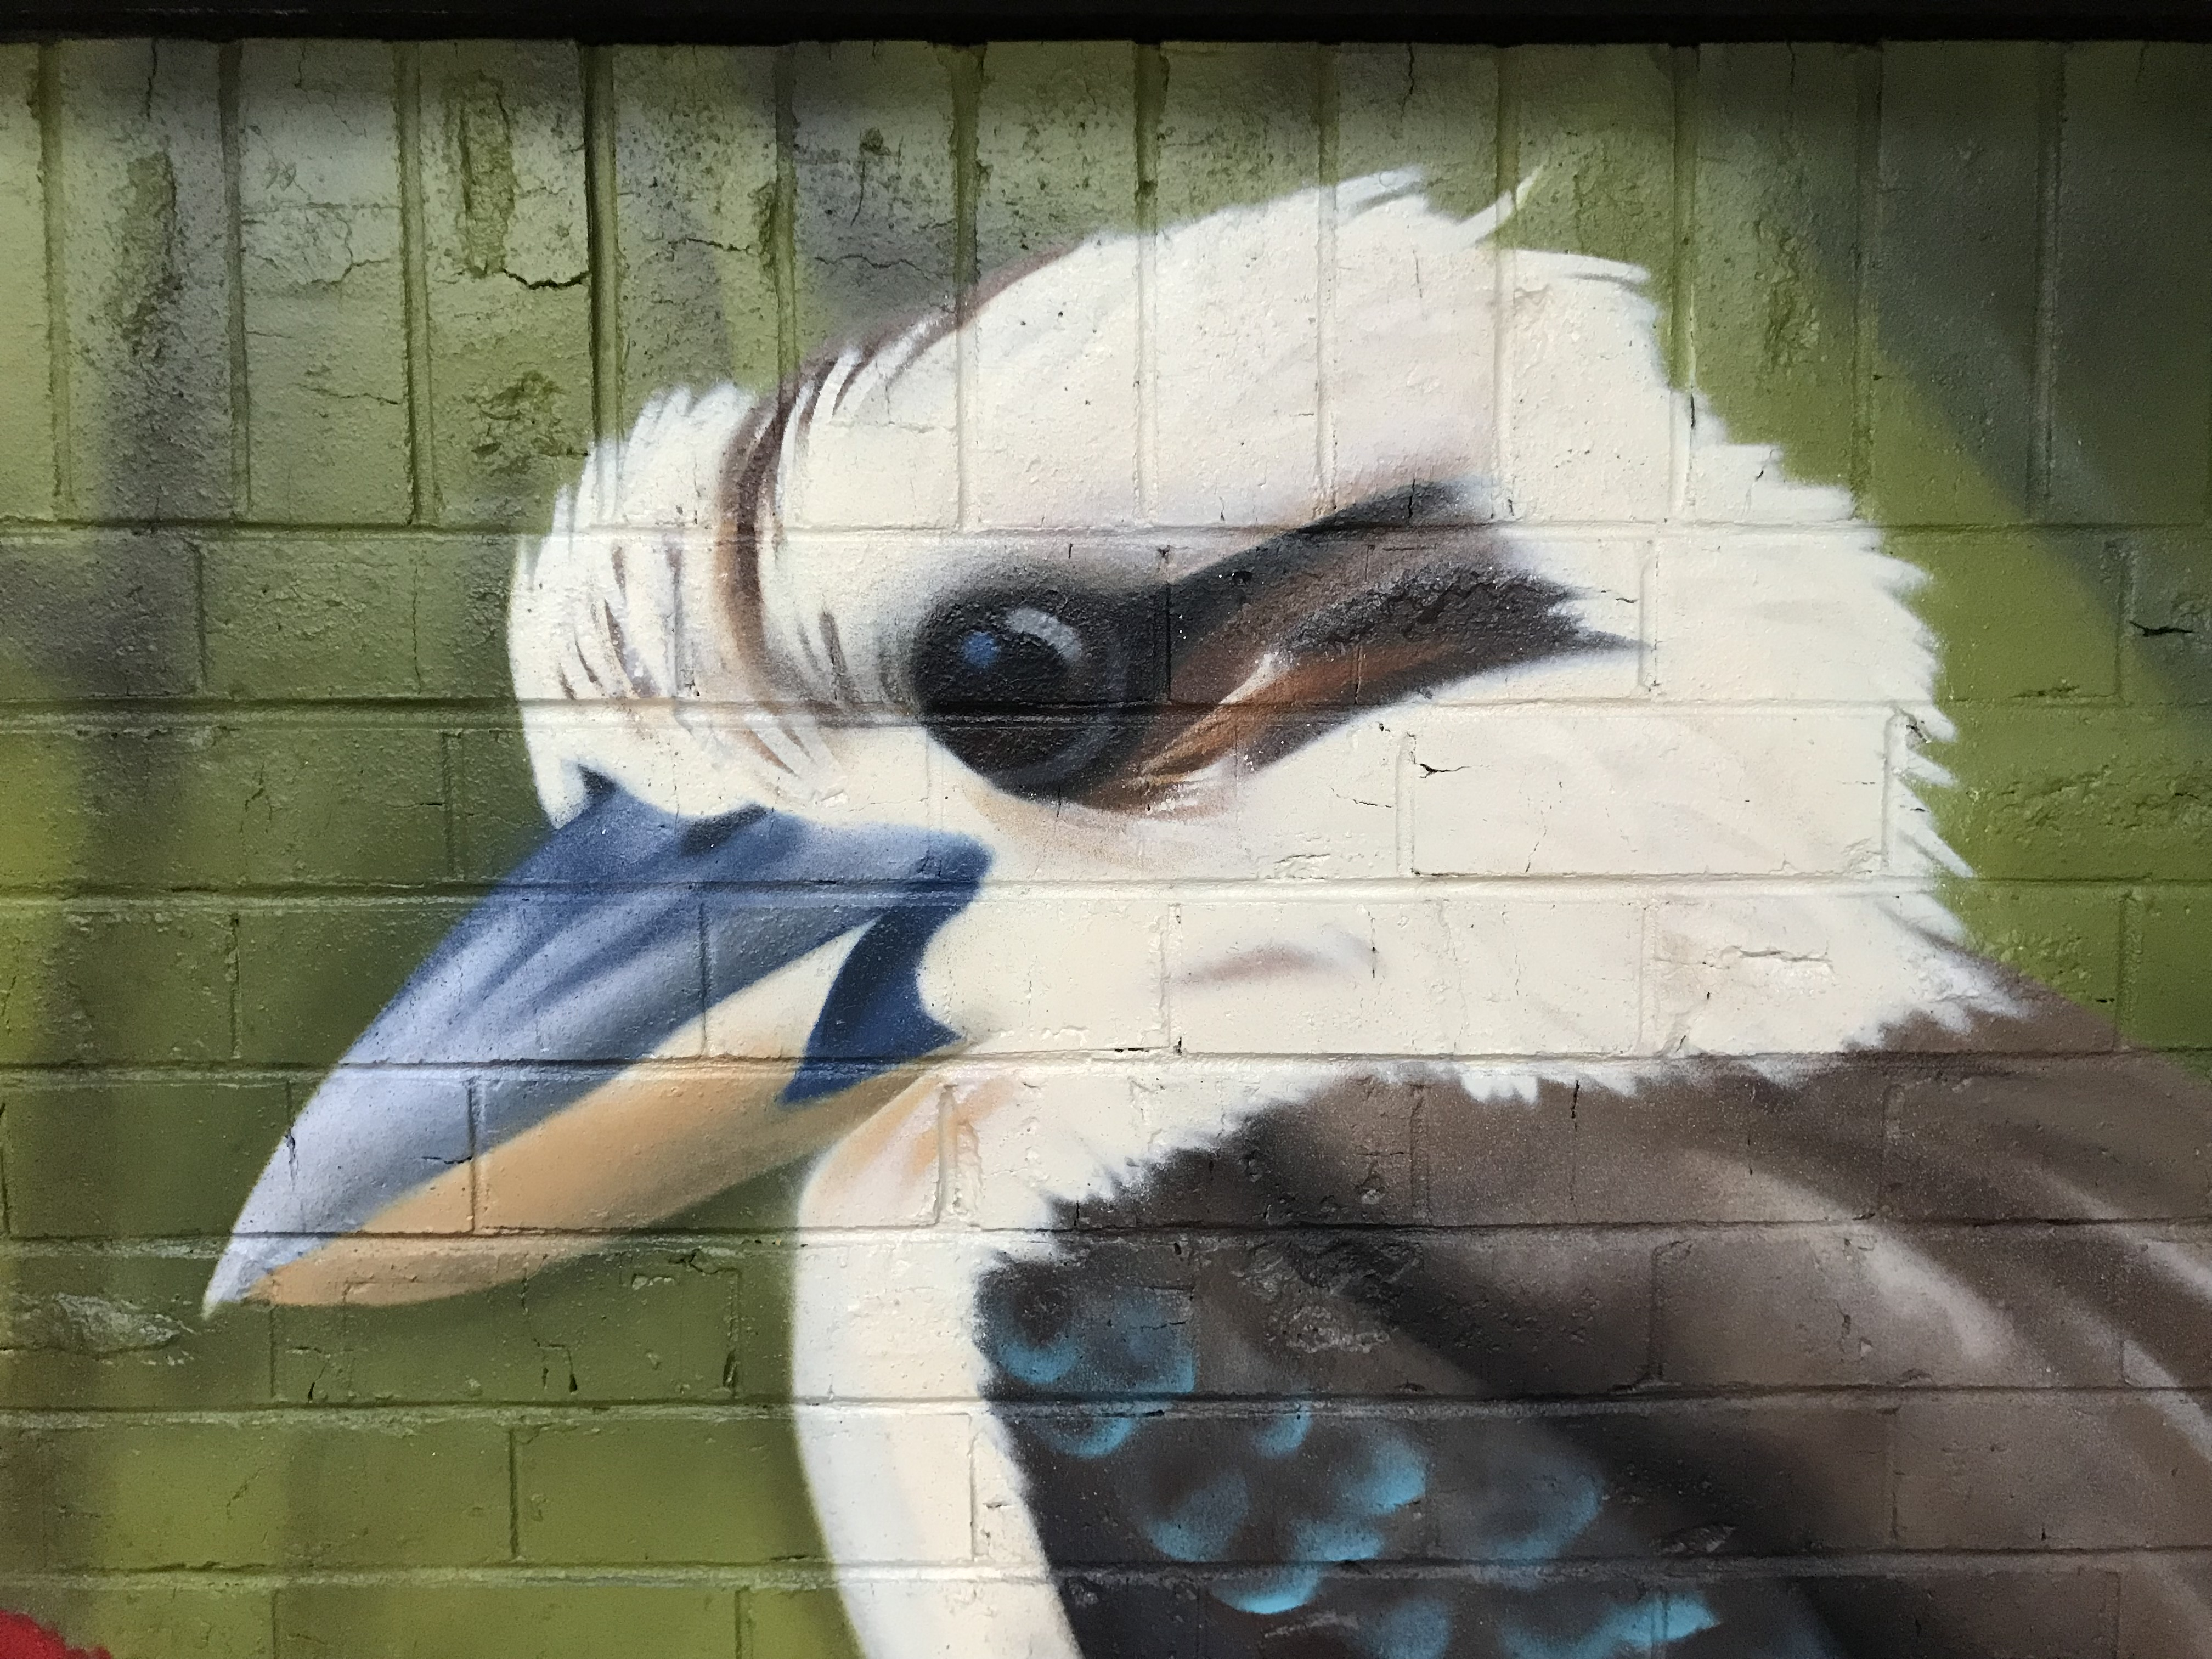 kookaburra bird mural